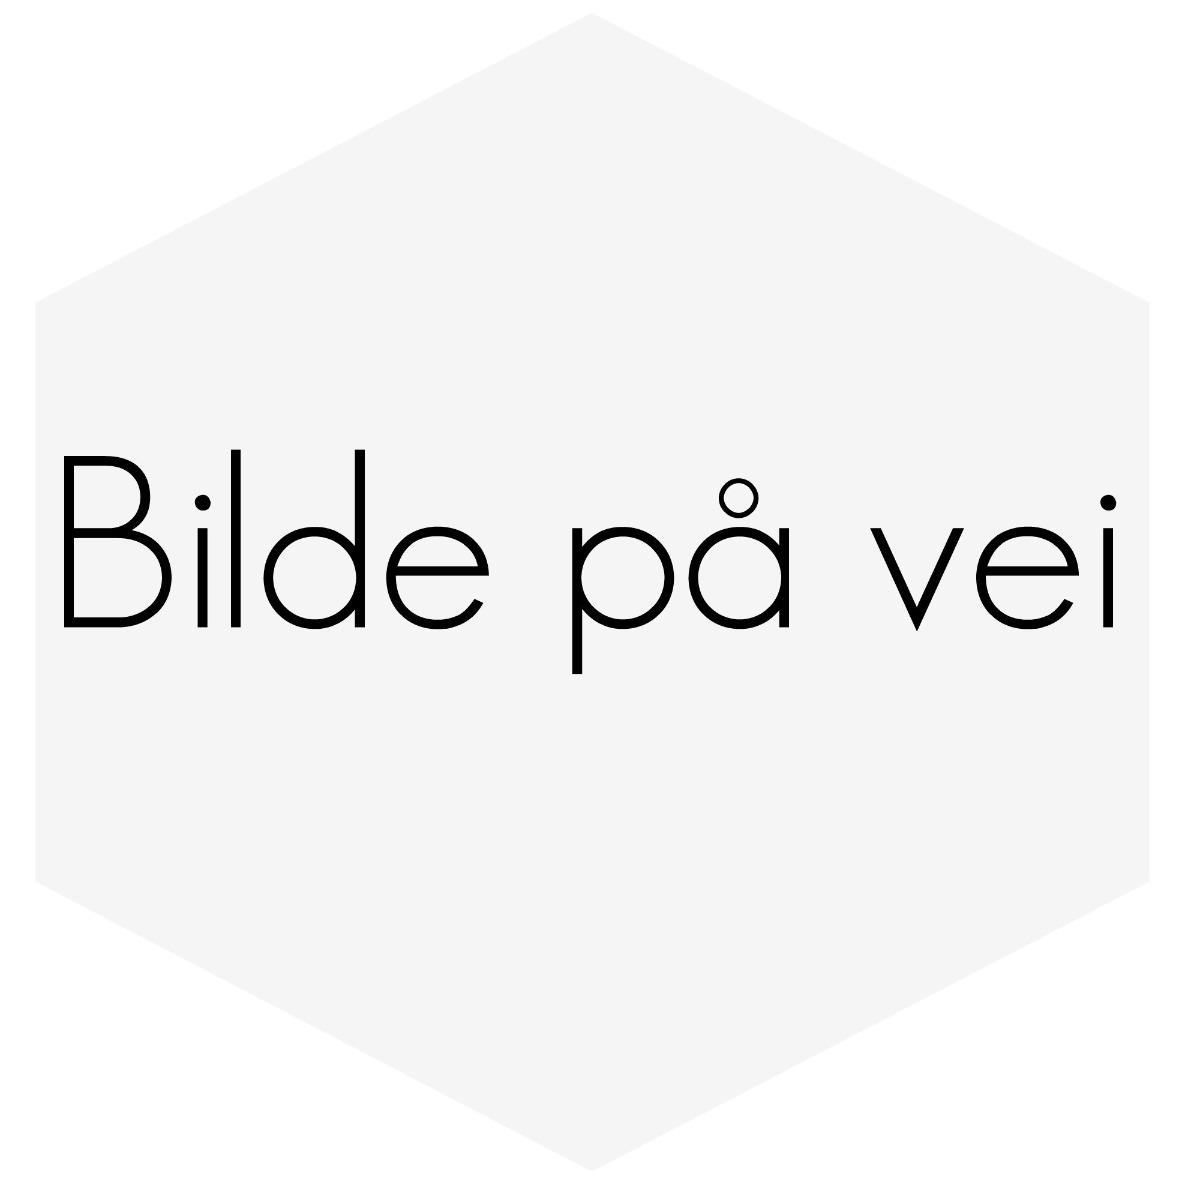 HÅNDBREKK WIRE BAK V70N 00-07 30793819, 3524199